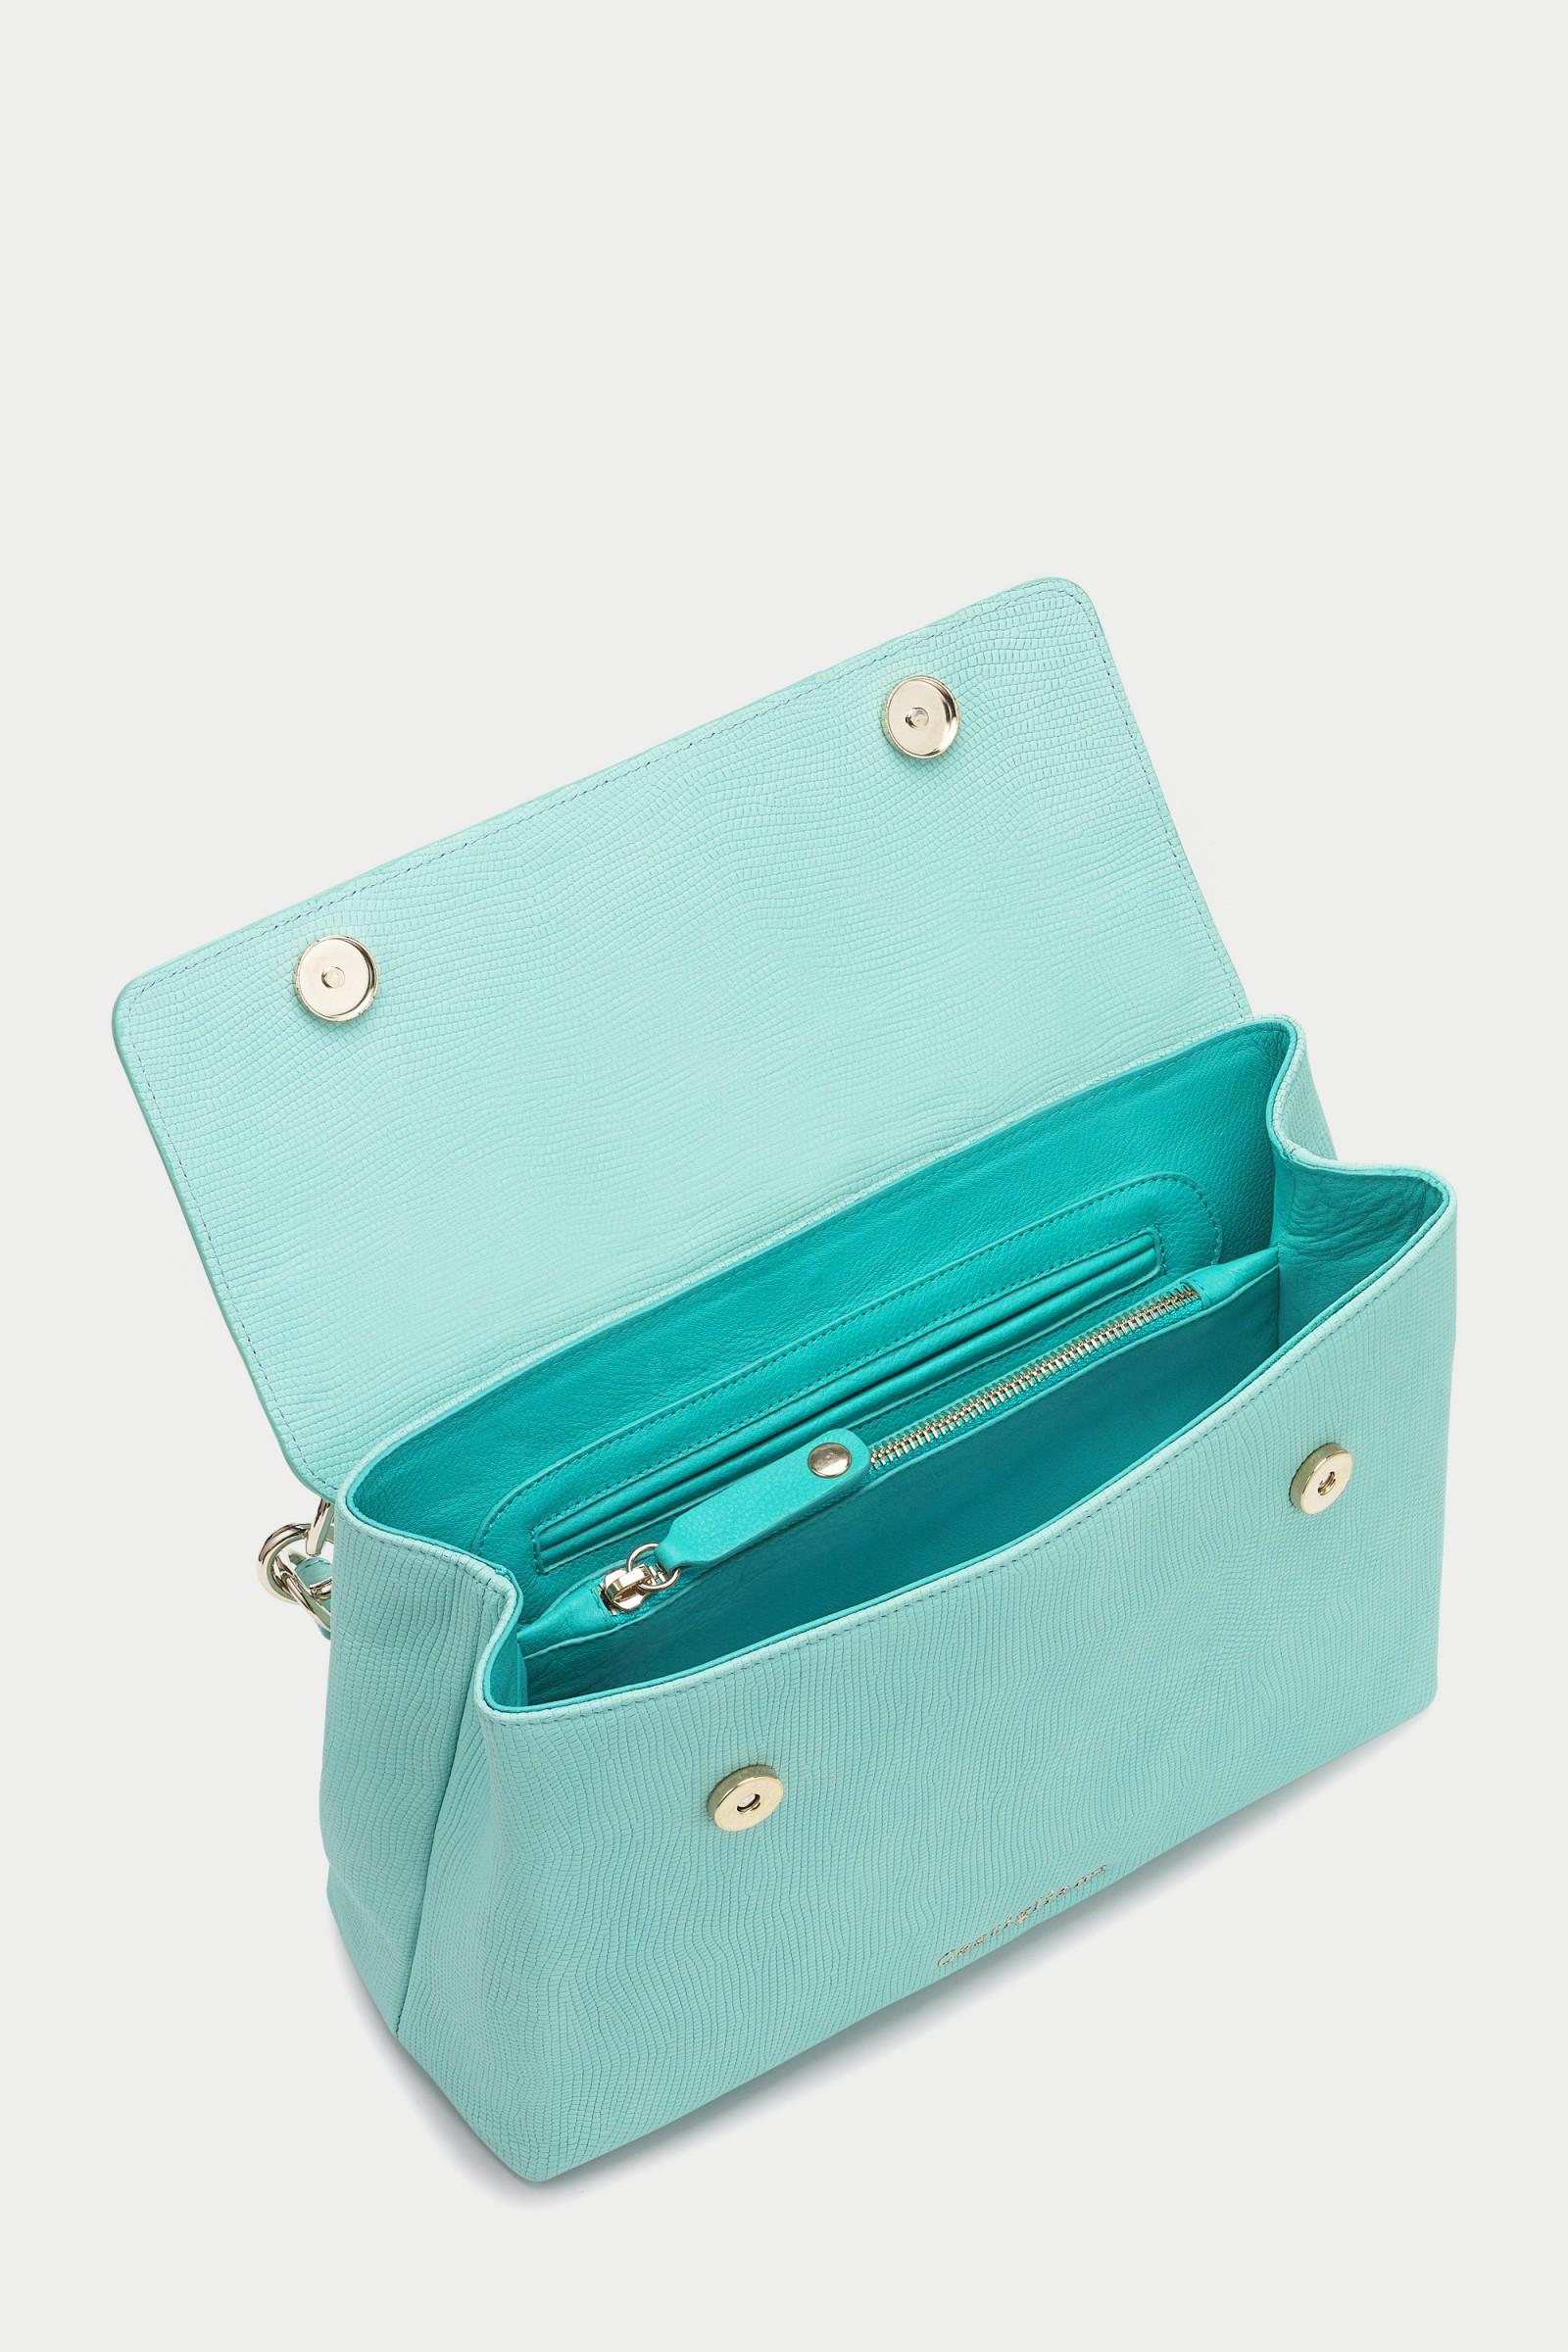 98dc9cdb21d ... CCB7003 leather handbag by Caroline Castigliano · ccb7003 designer  handbags by Caroline Castigliano · Briella ANACONDA ROSA Pink Leather  Handbag